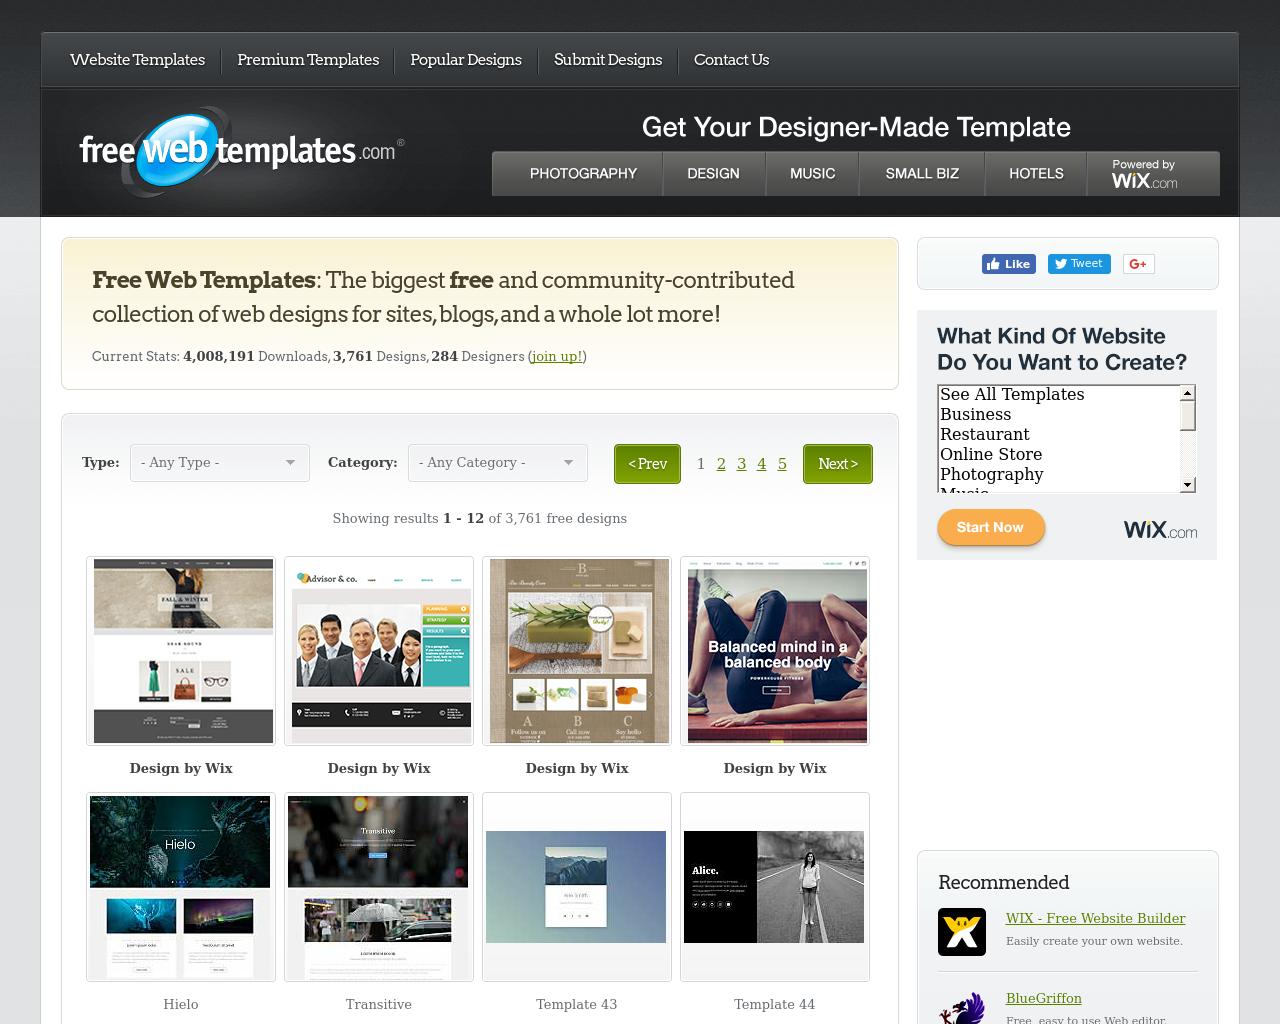 FreeWebTemplates.com-Advertising-Reviews-Pricing